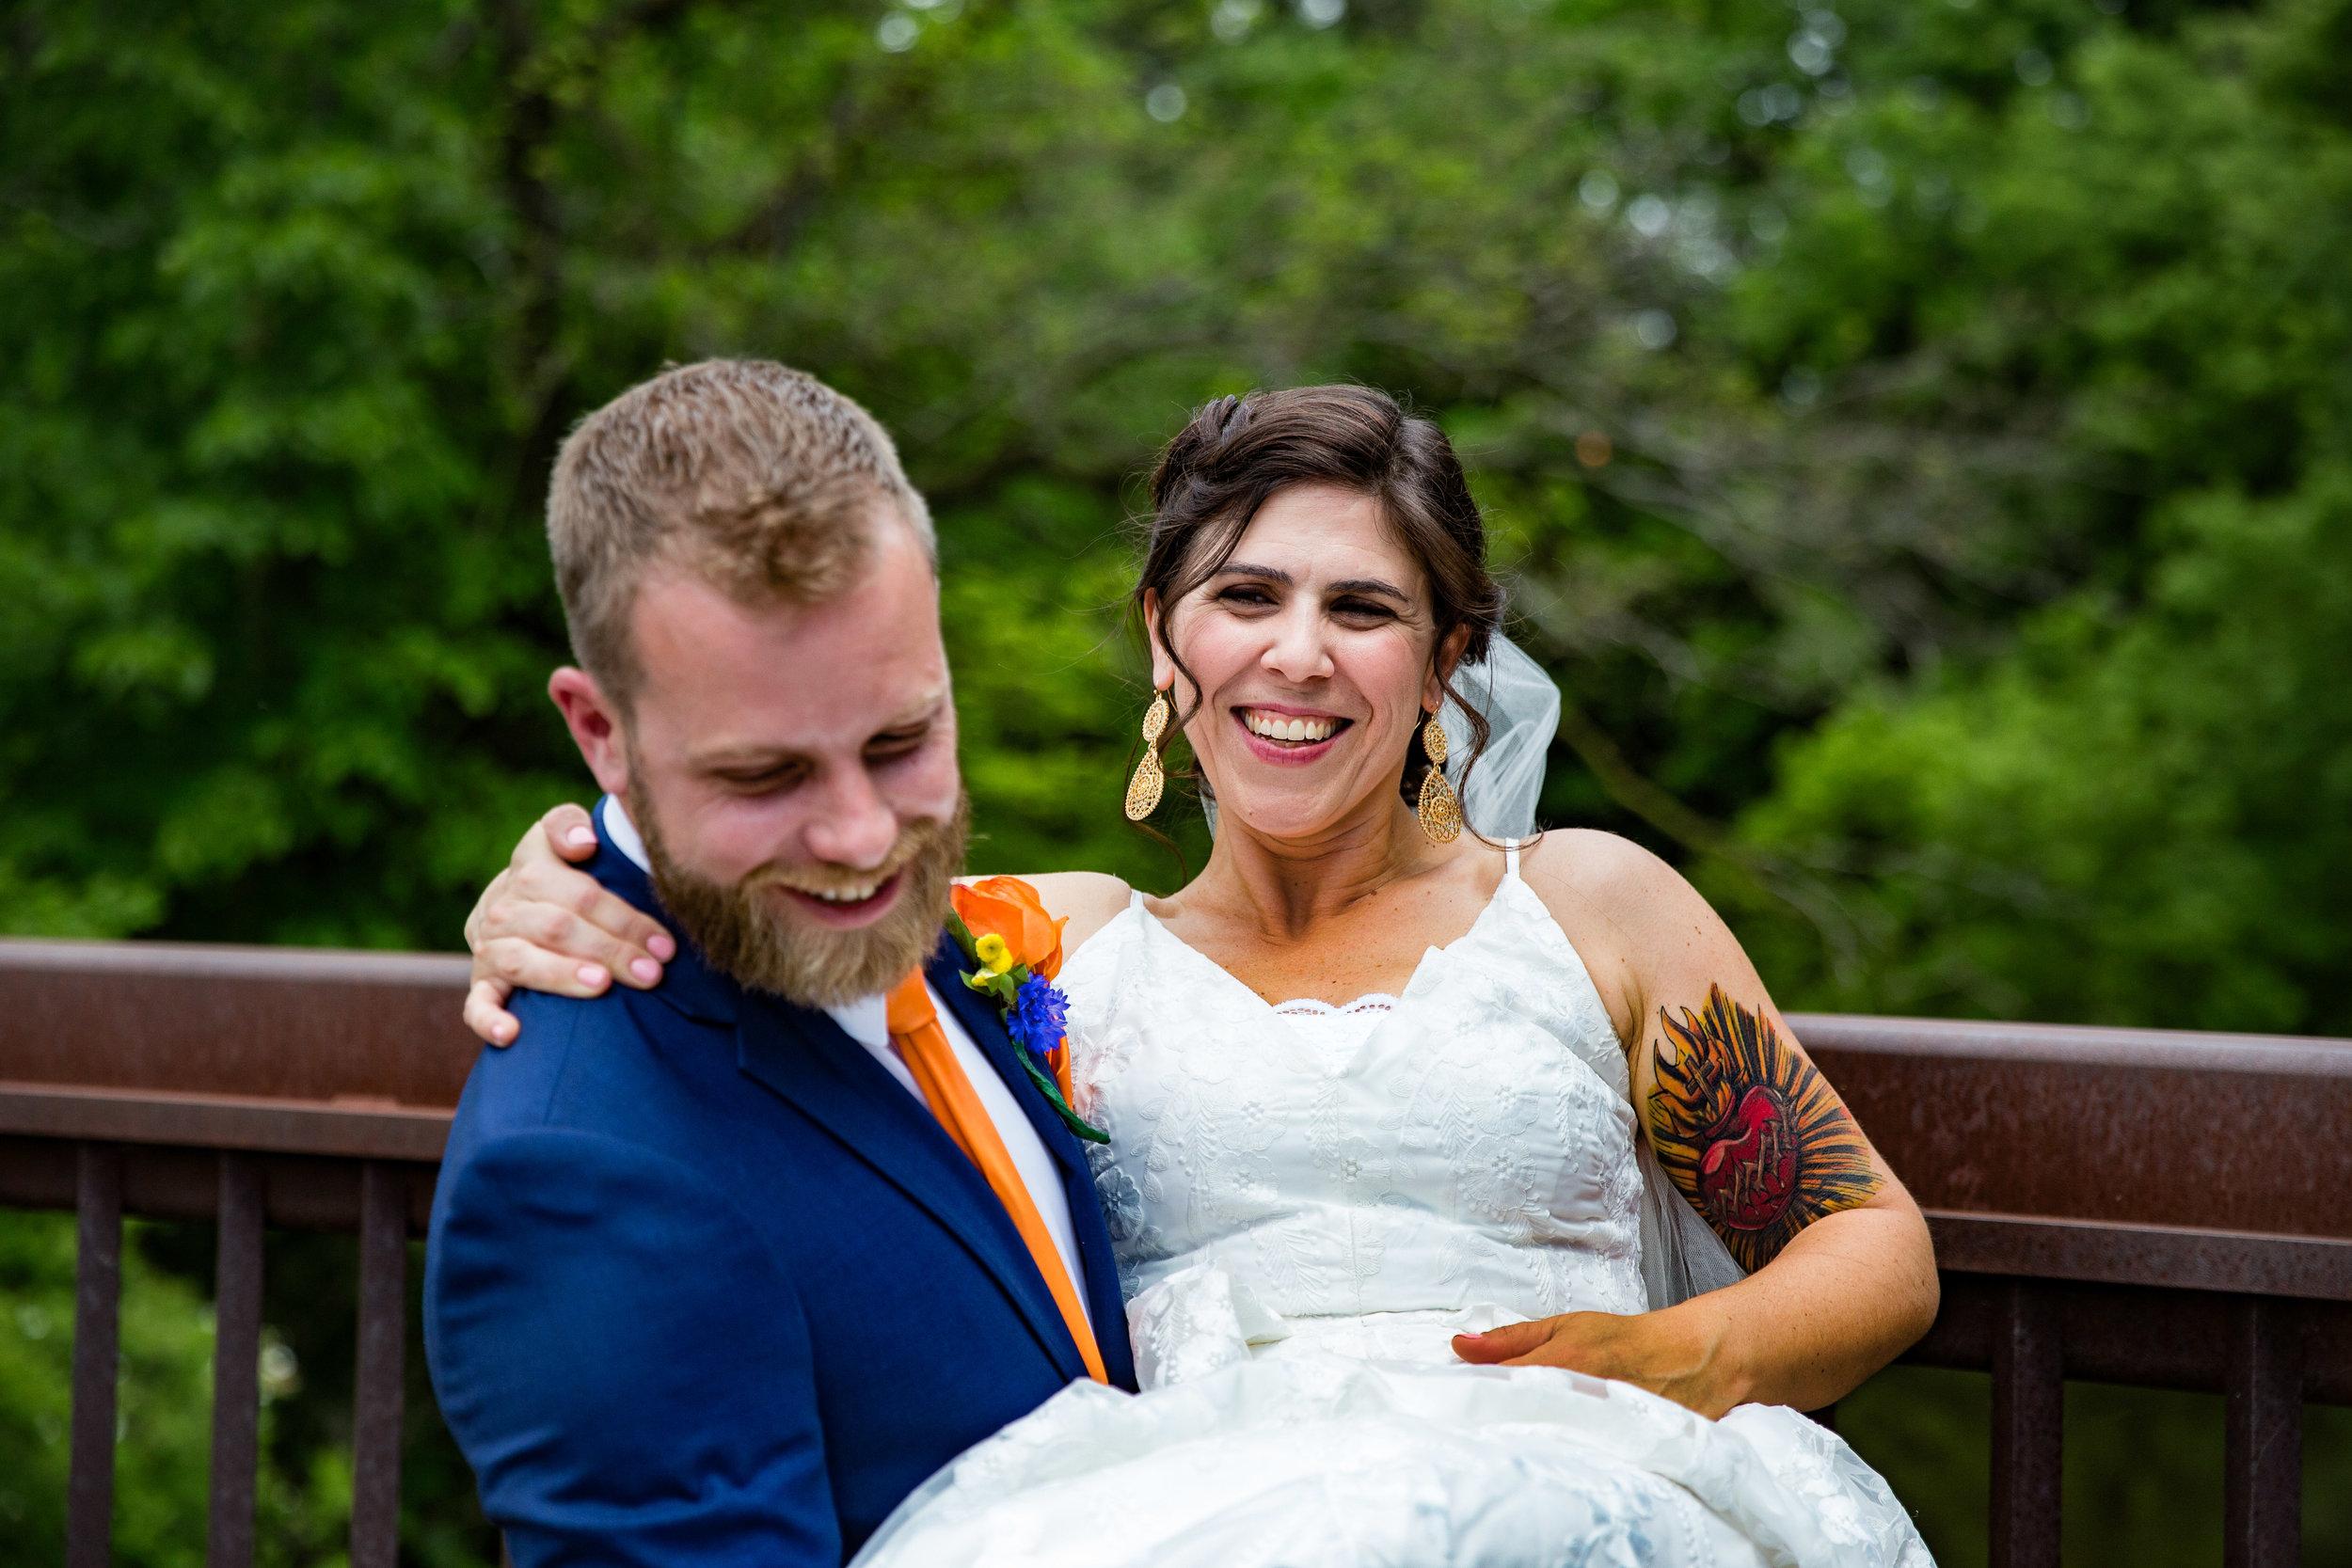 Natalie and Dallas Mooney Wedding 6-8-19_Tania Watt Photography-252.jpg